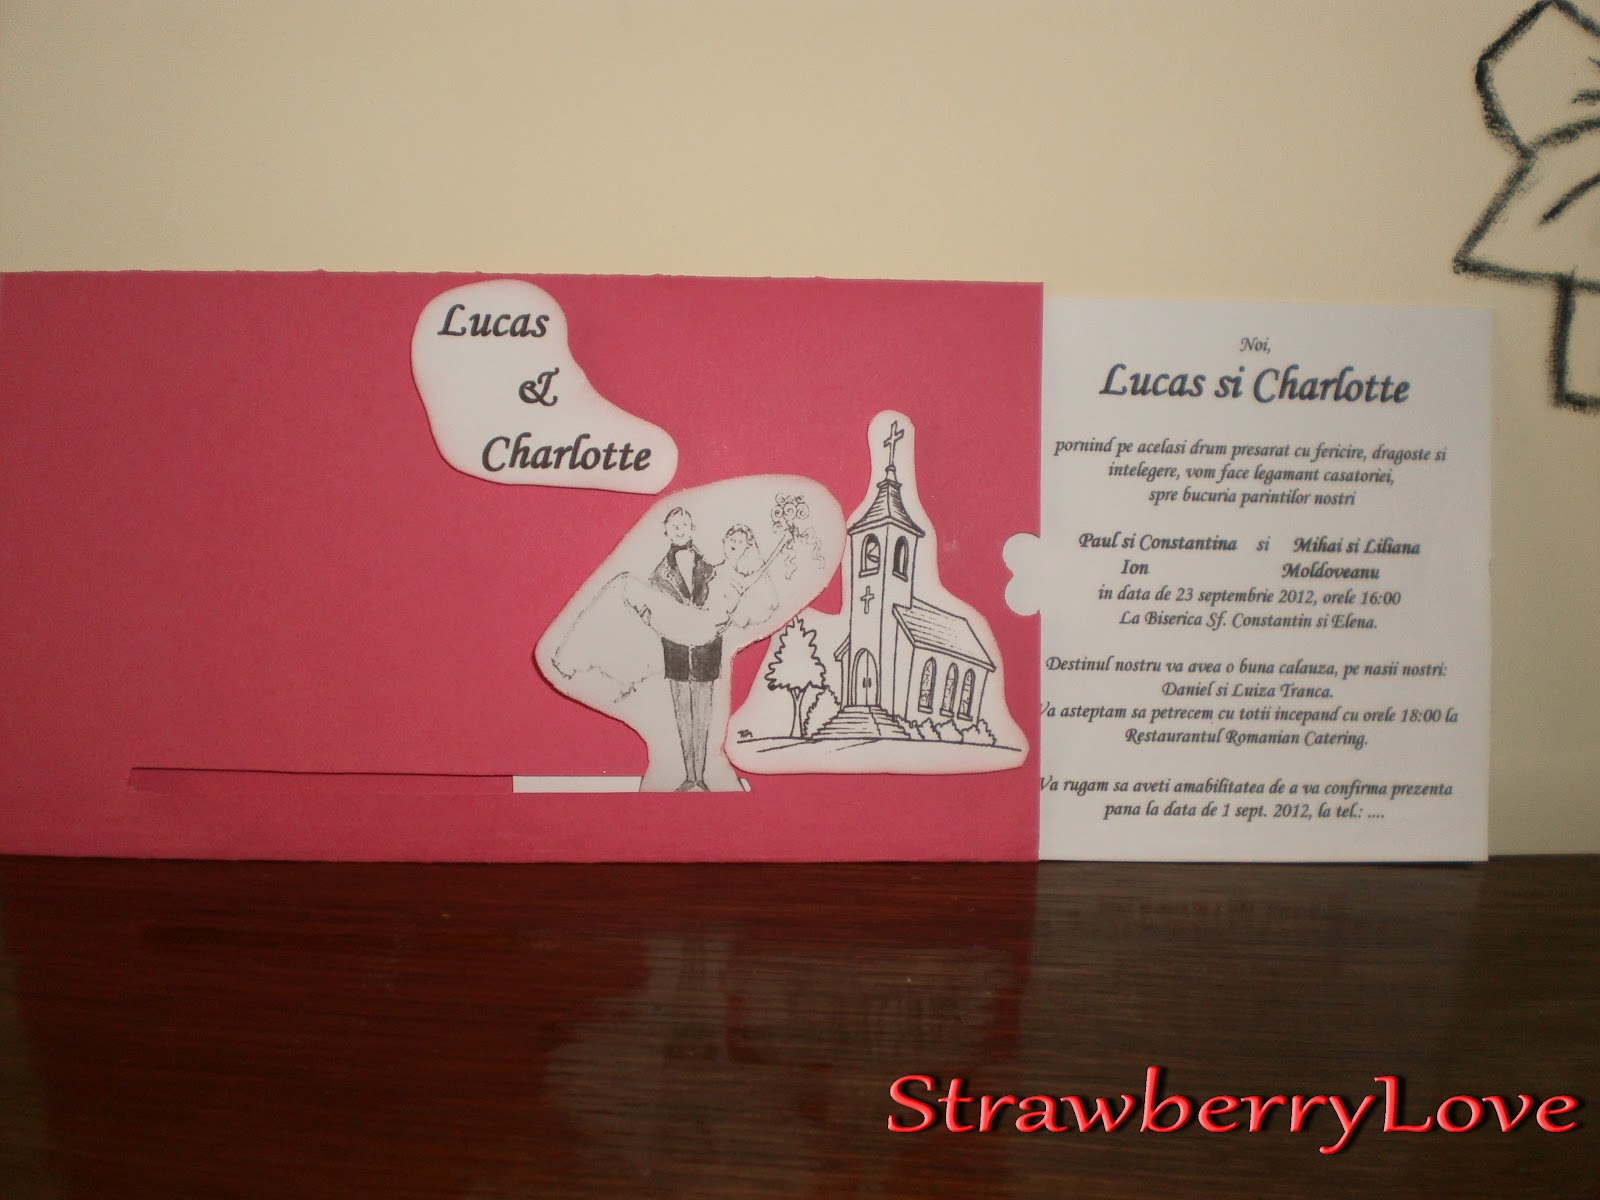 Strawberry Love by Reny: Handmade Wedding Invitations